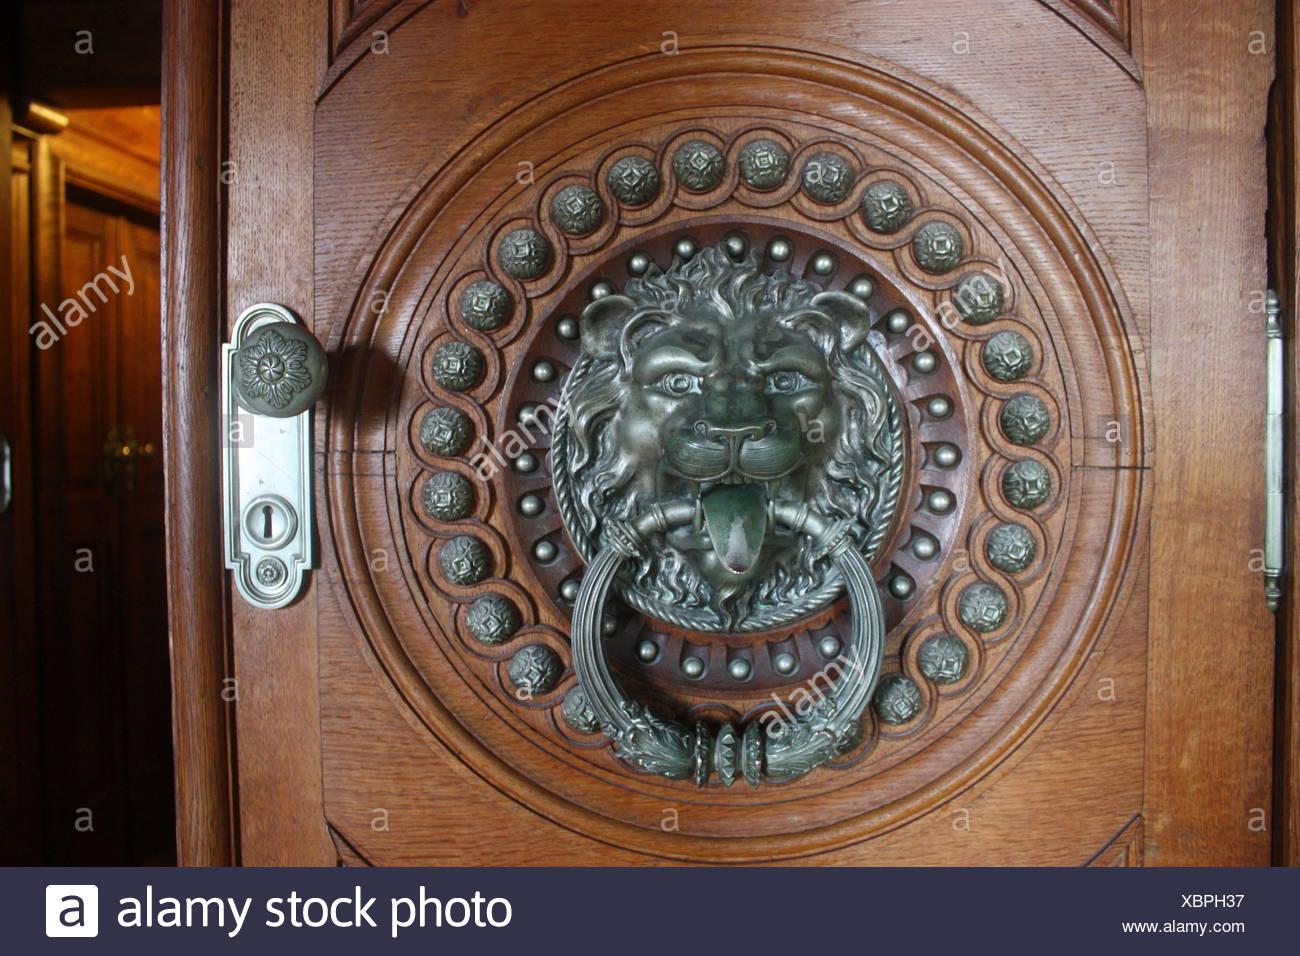 Silver Lion Shaped Knocker On Wooden Door   Stock Image